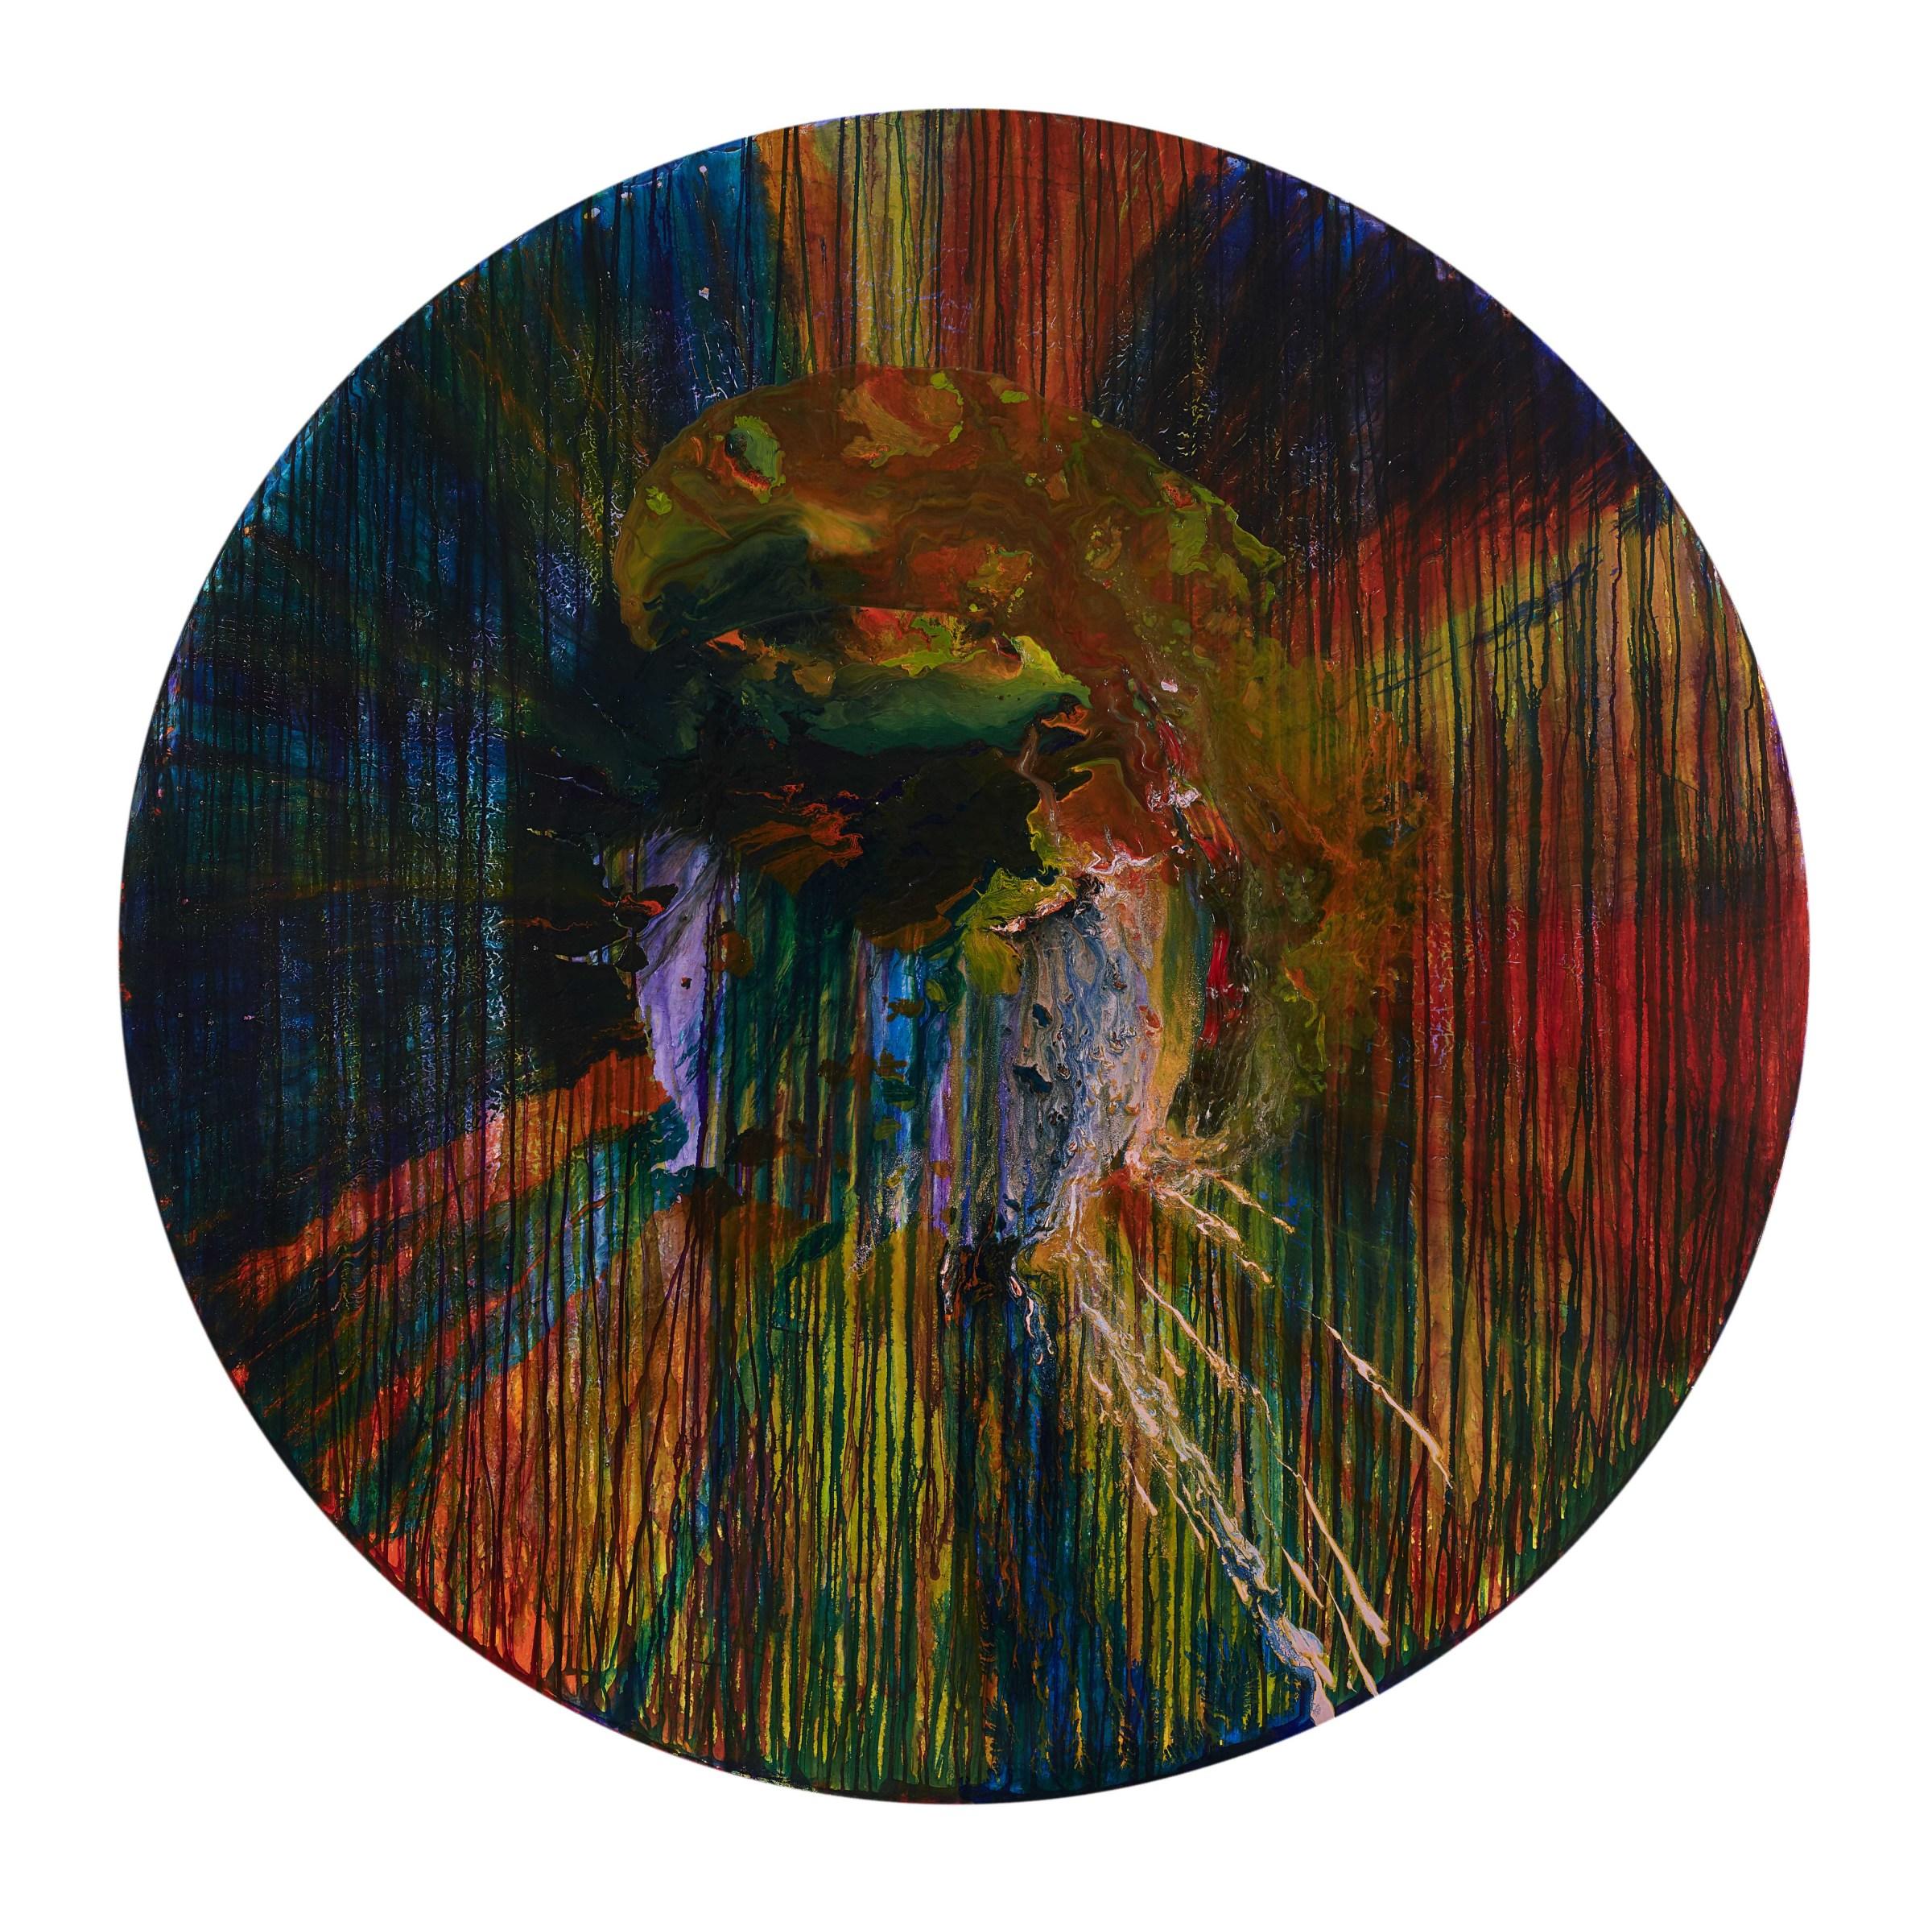 <span class=&#34;link fancybox-details-link&#34;><a href=&#34;/artists/66-elsa-duault/works/6719-elsa-duault-texture-and-time-2-2018/&#34;>View Detail Page</a></span><div class=&#34;artist&#34;><strong>Elsa Duault</strong></div> <div class=&#34;title&#34;><em>Texture and Time 2 </em>, 2018</div> <div class=&#34;medium&#34;>Ink and Transparent Coat on Canvas</div> <div class=&#34;dimensions&#34;>Unframed Diameter: 180cm</div>